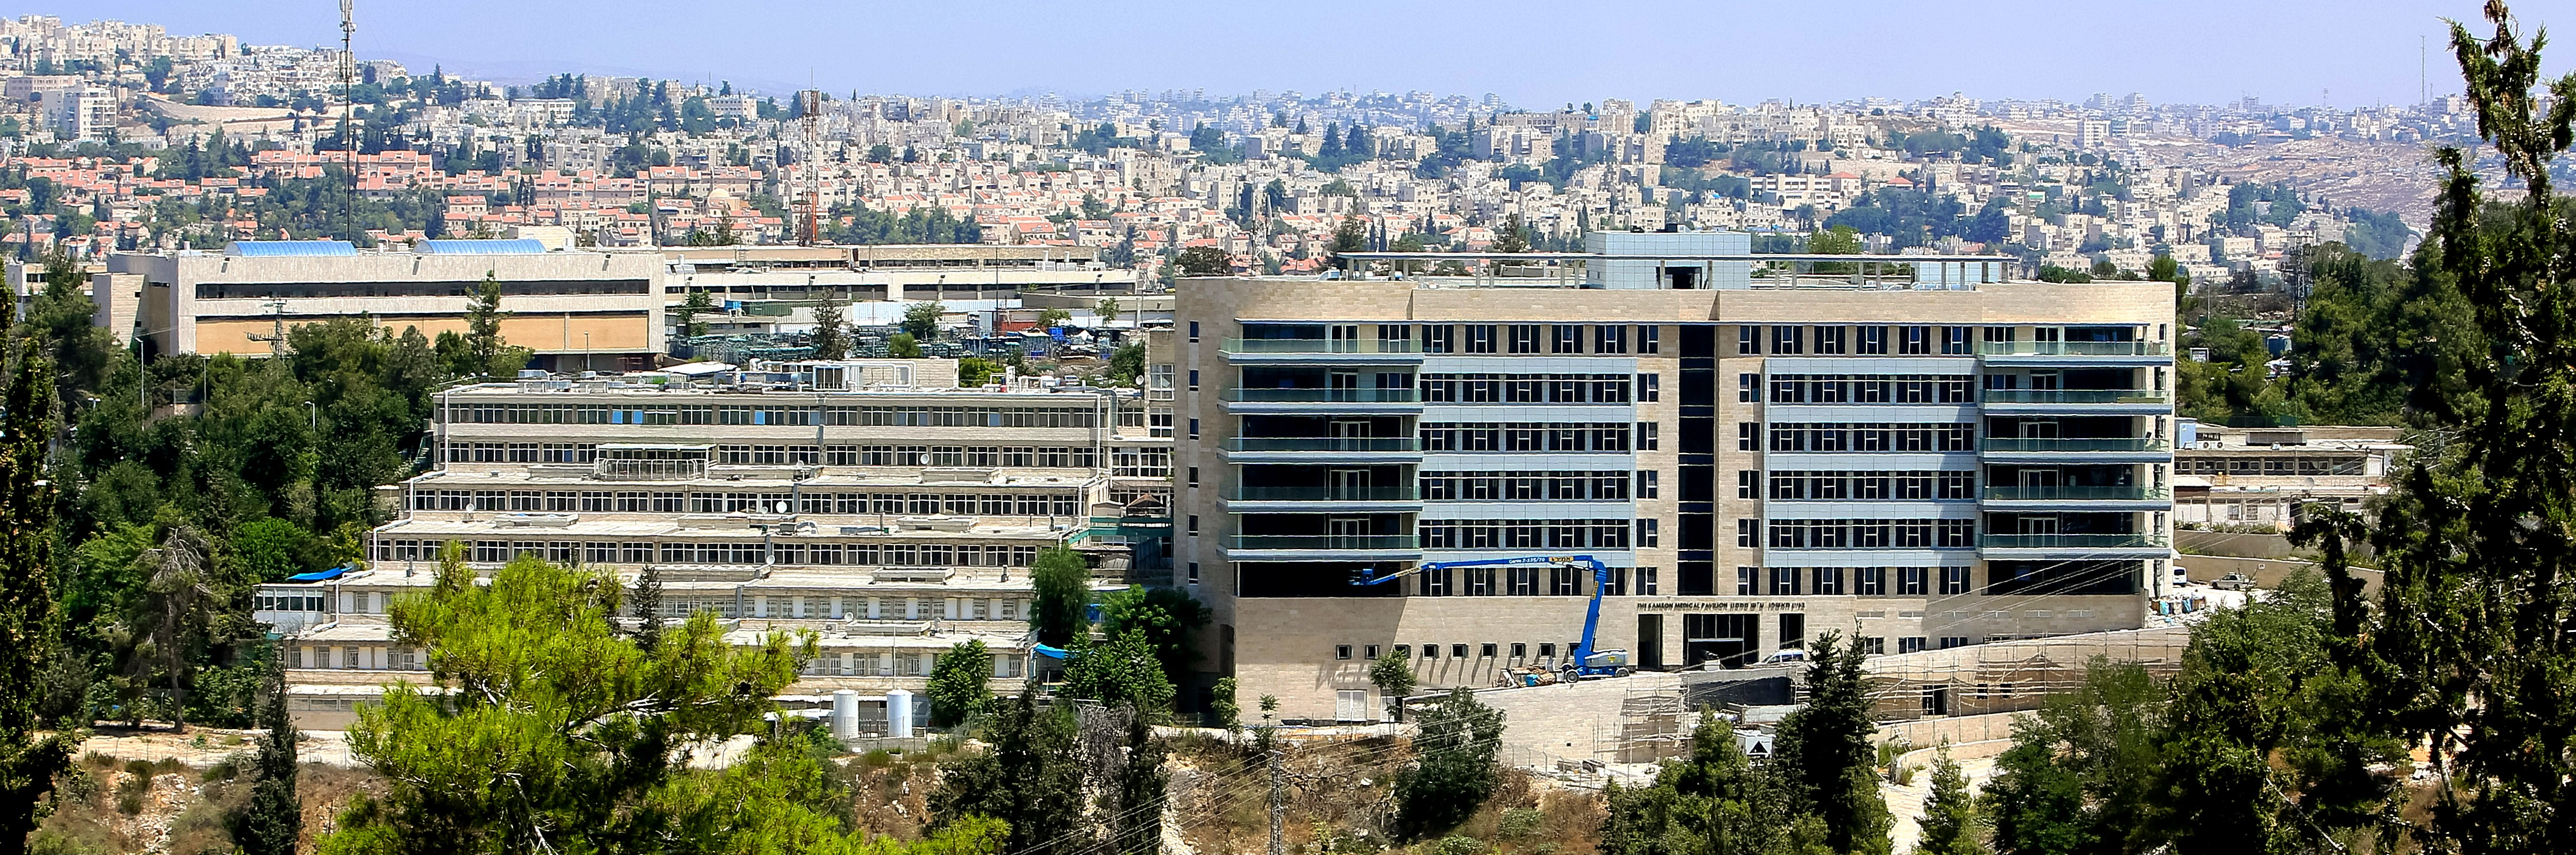 Herzog Hospital